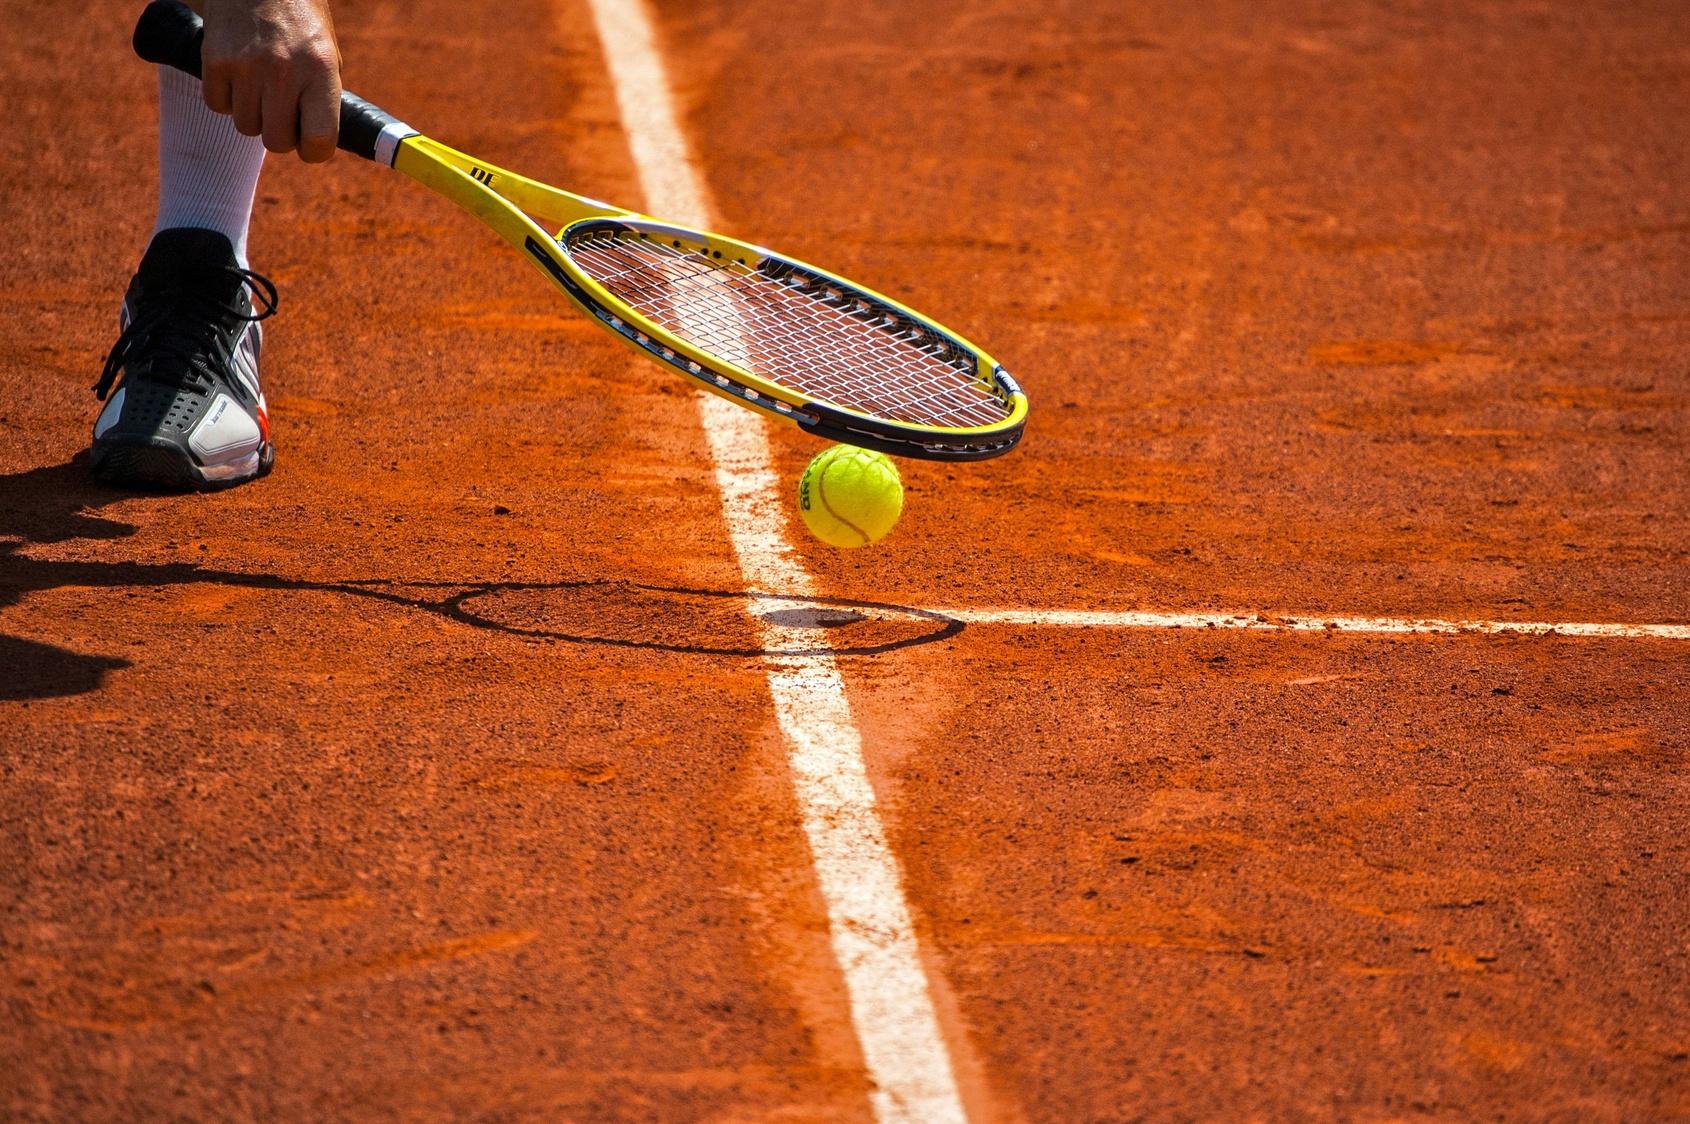 Terrain de tennis, raquette et balle jaune